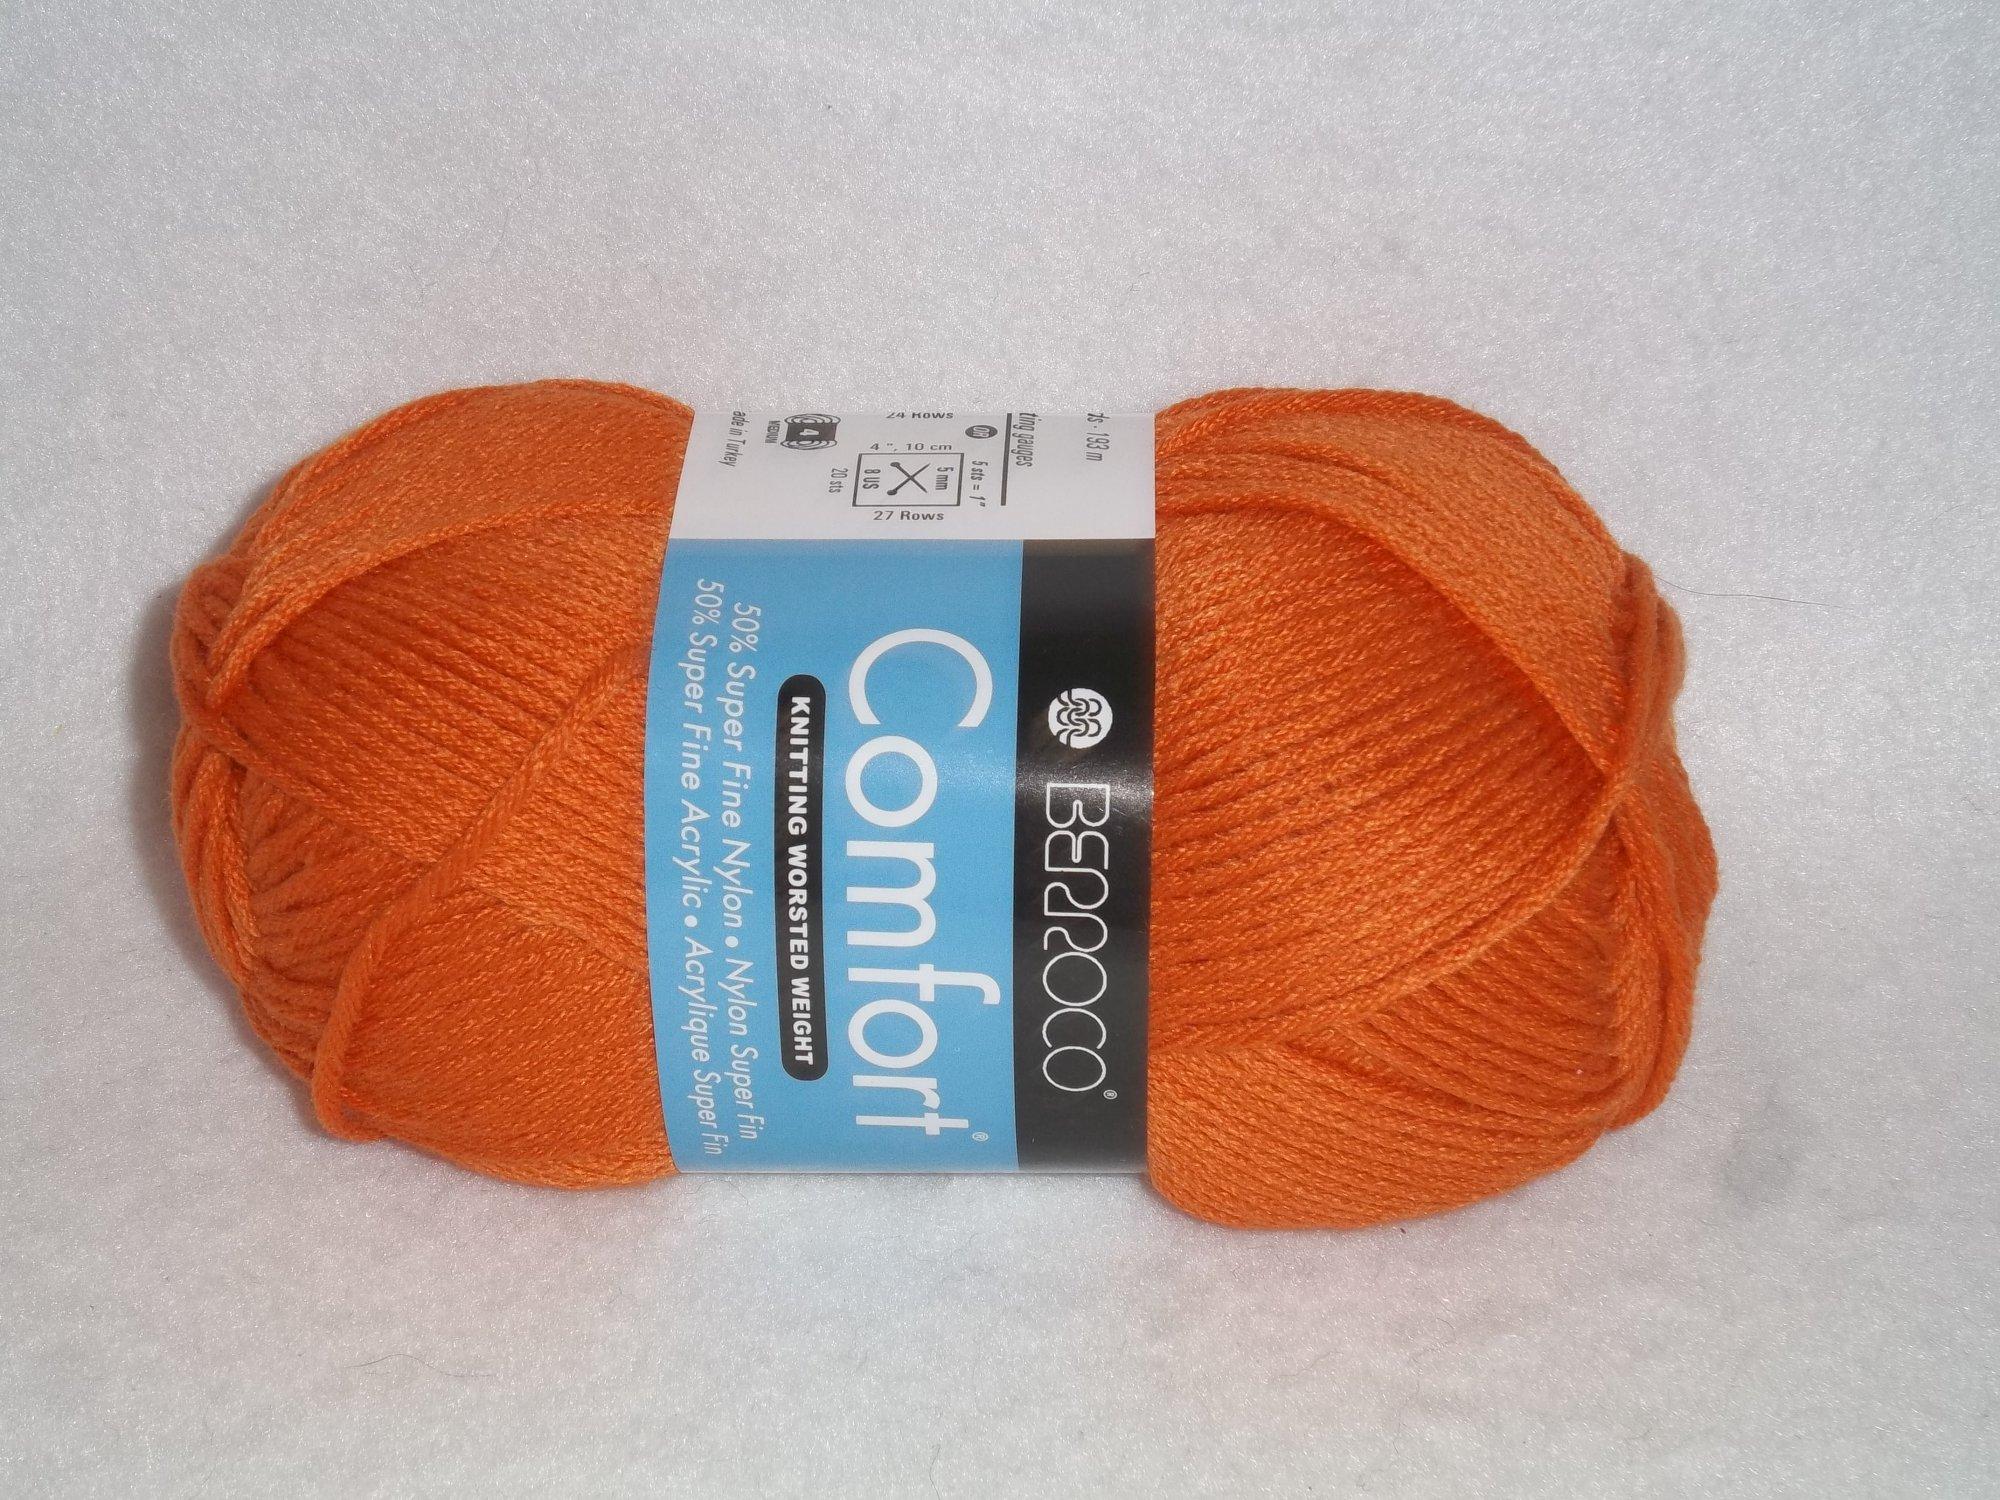 Comfort Worsted 9731 - Tangerine